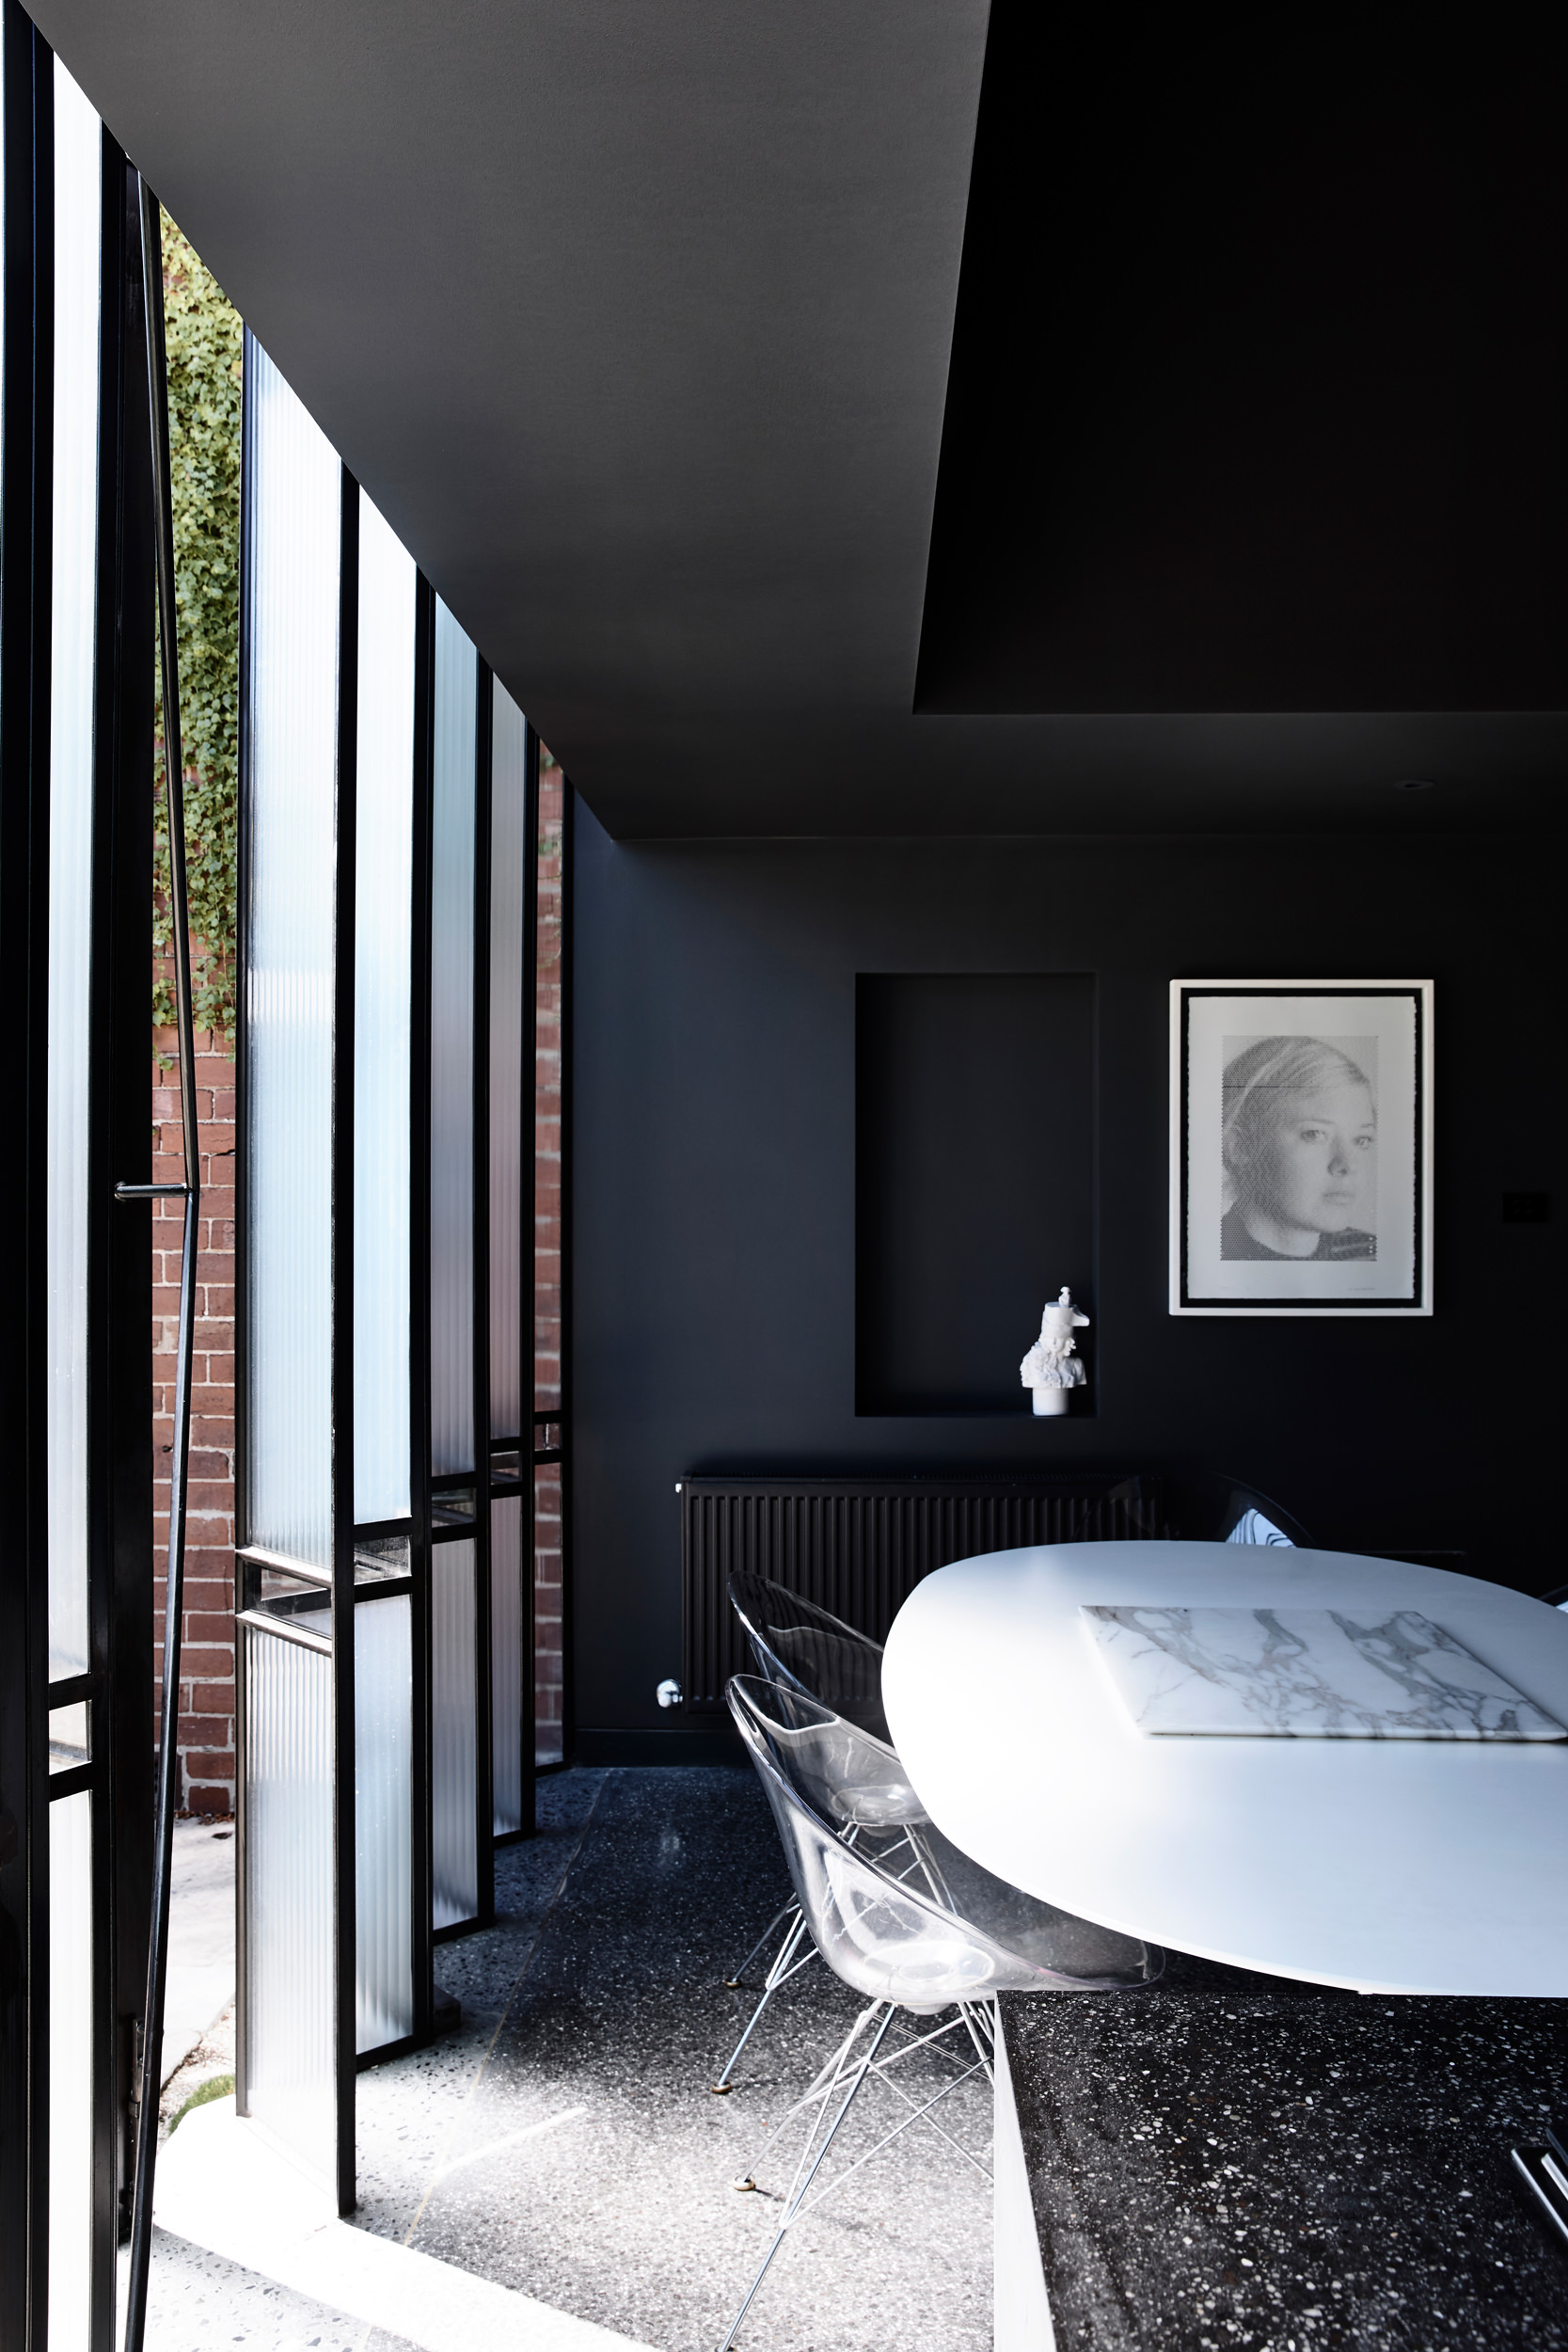 Powell Street House South Yarra by Robert Simeoni, Australian Architecture, Photo Derek Swalwell | Yellowtrace